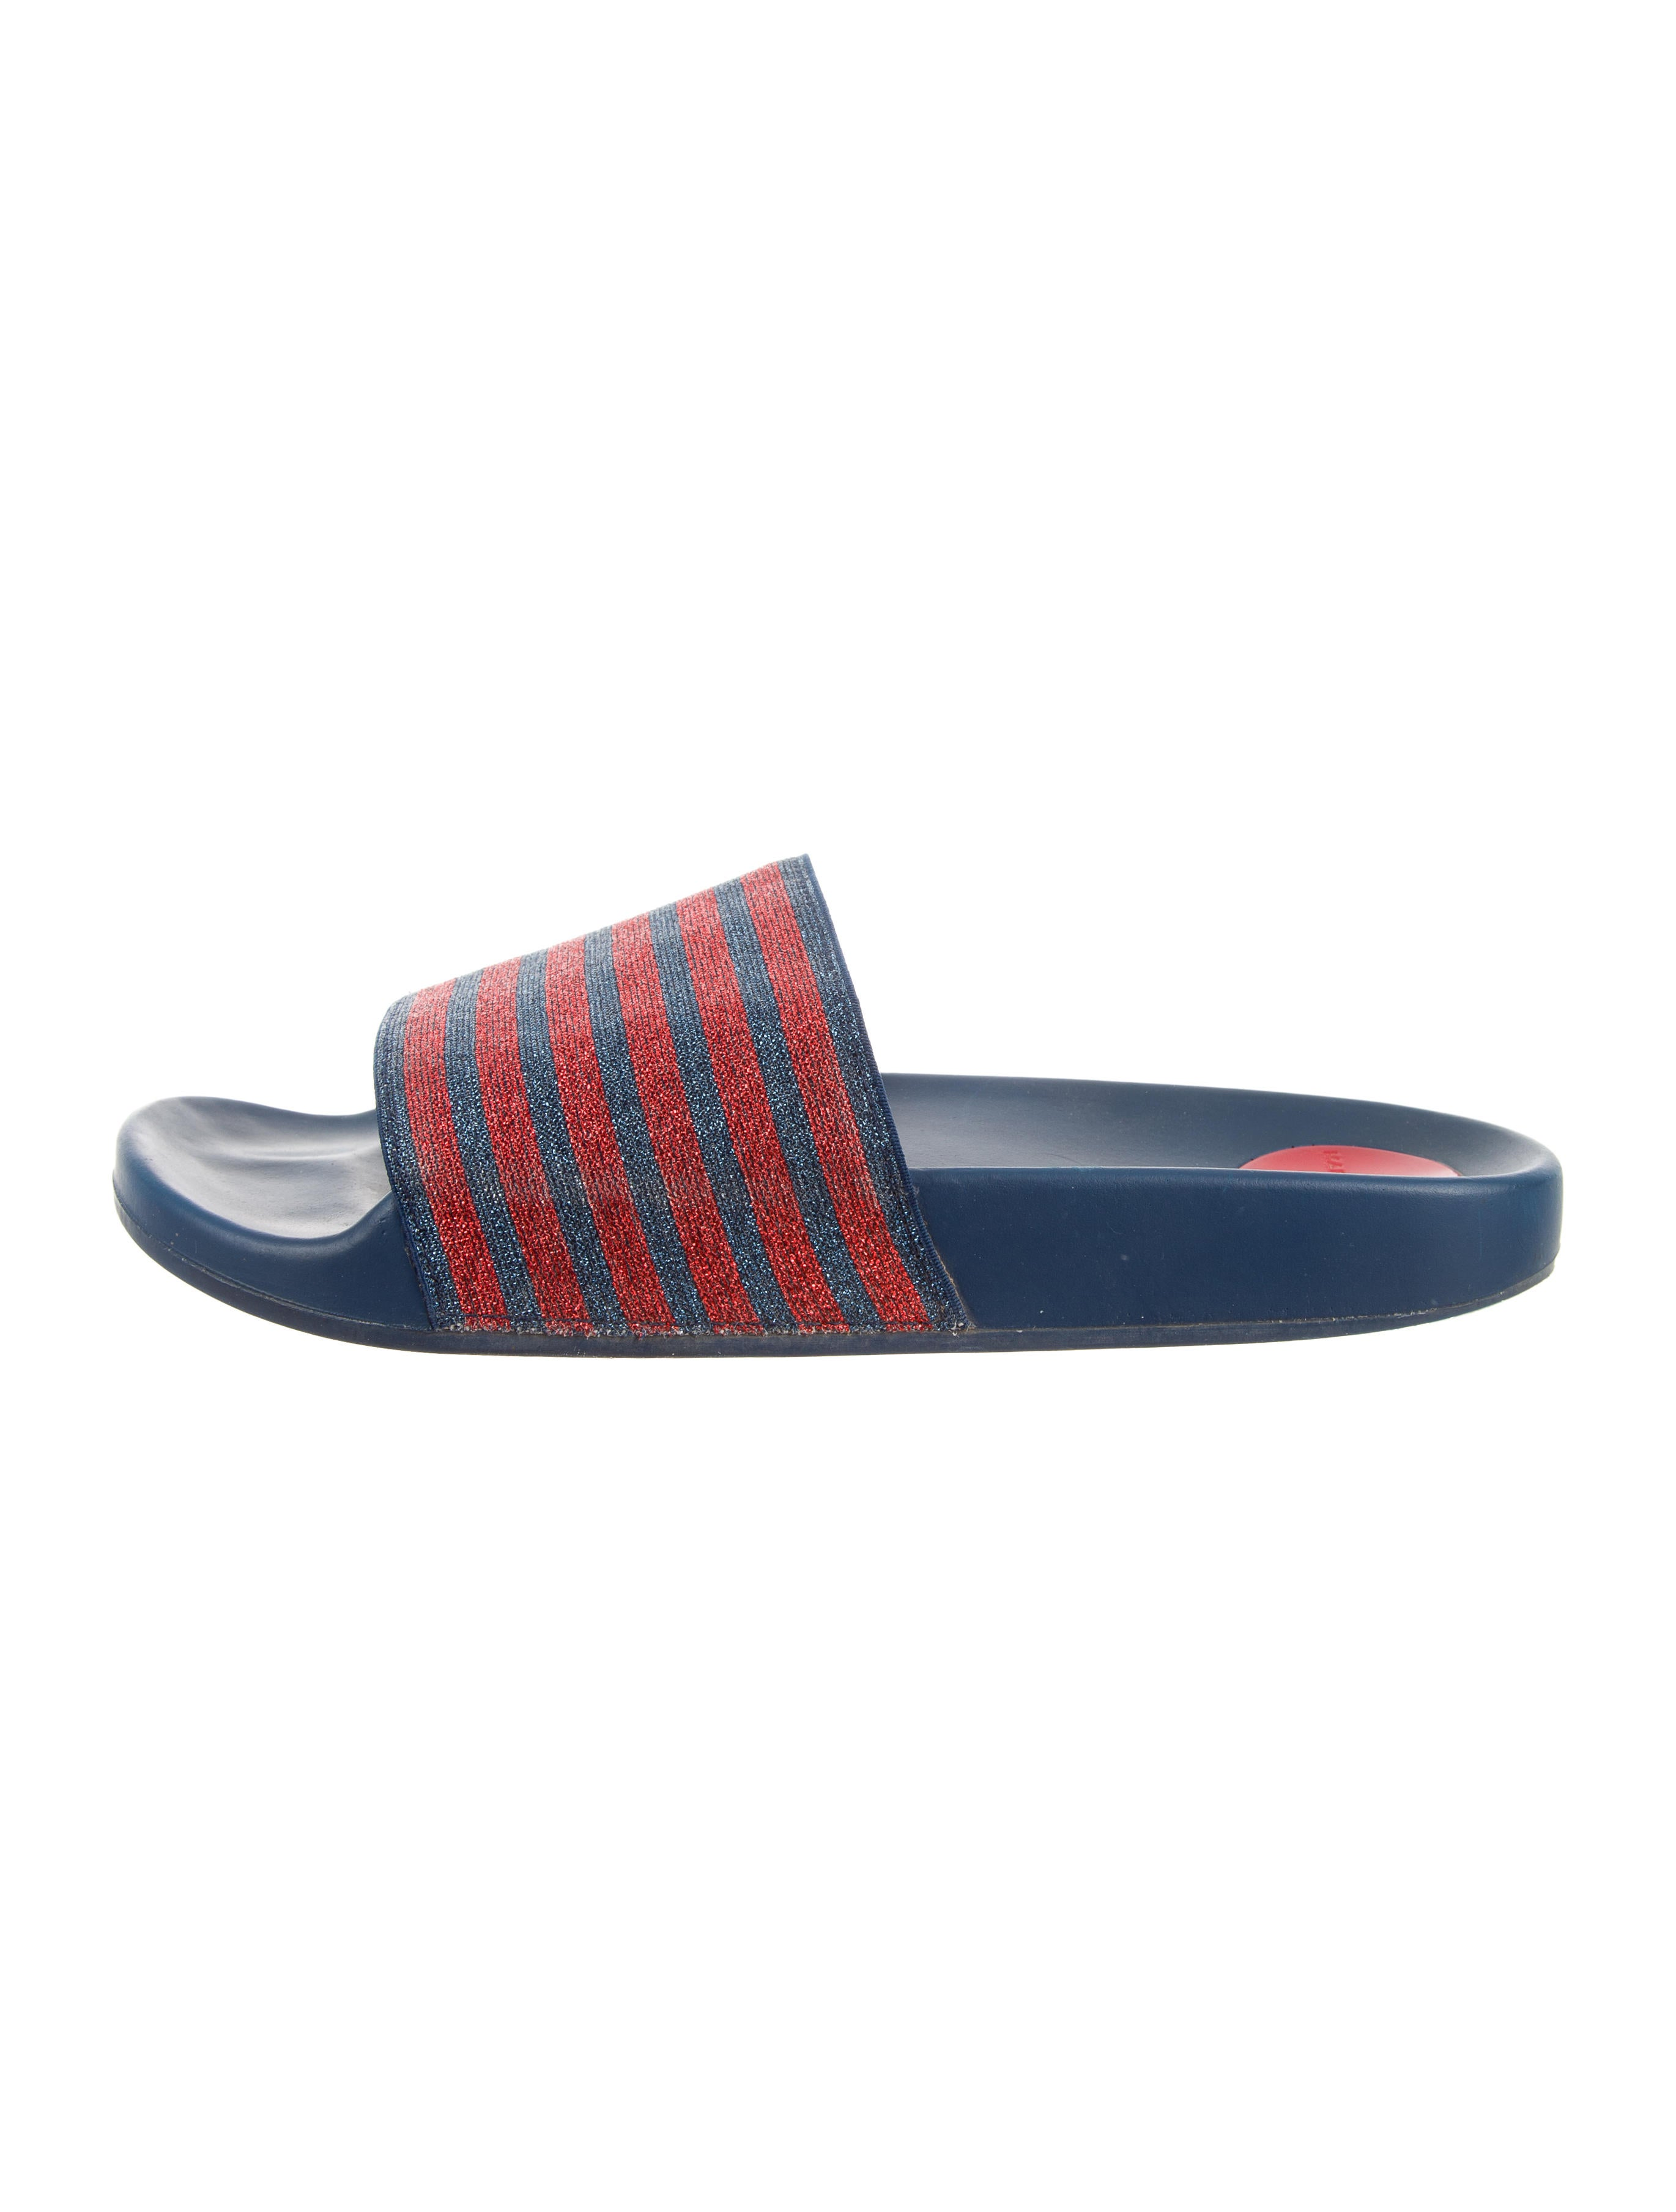 Marc Jacobs Striped Glitter Slide Sandals outlet browse reliable for sale huge surprise sale online aNL9LFeX